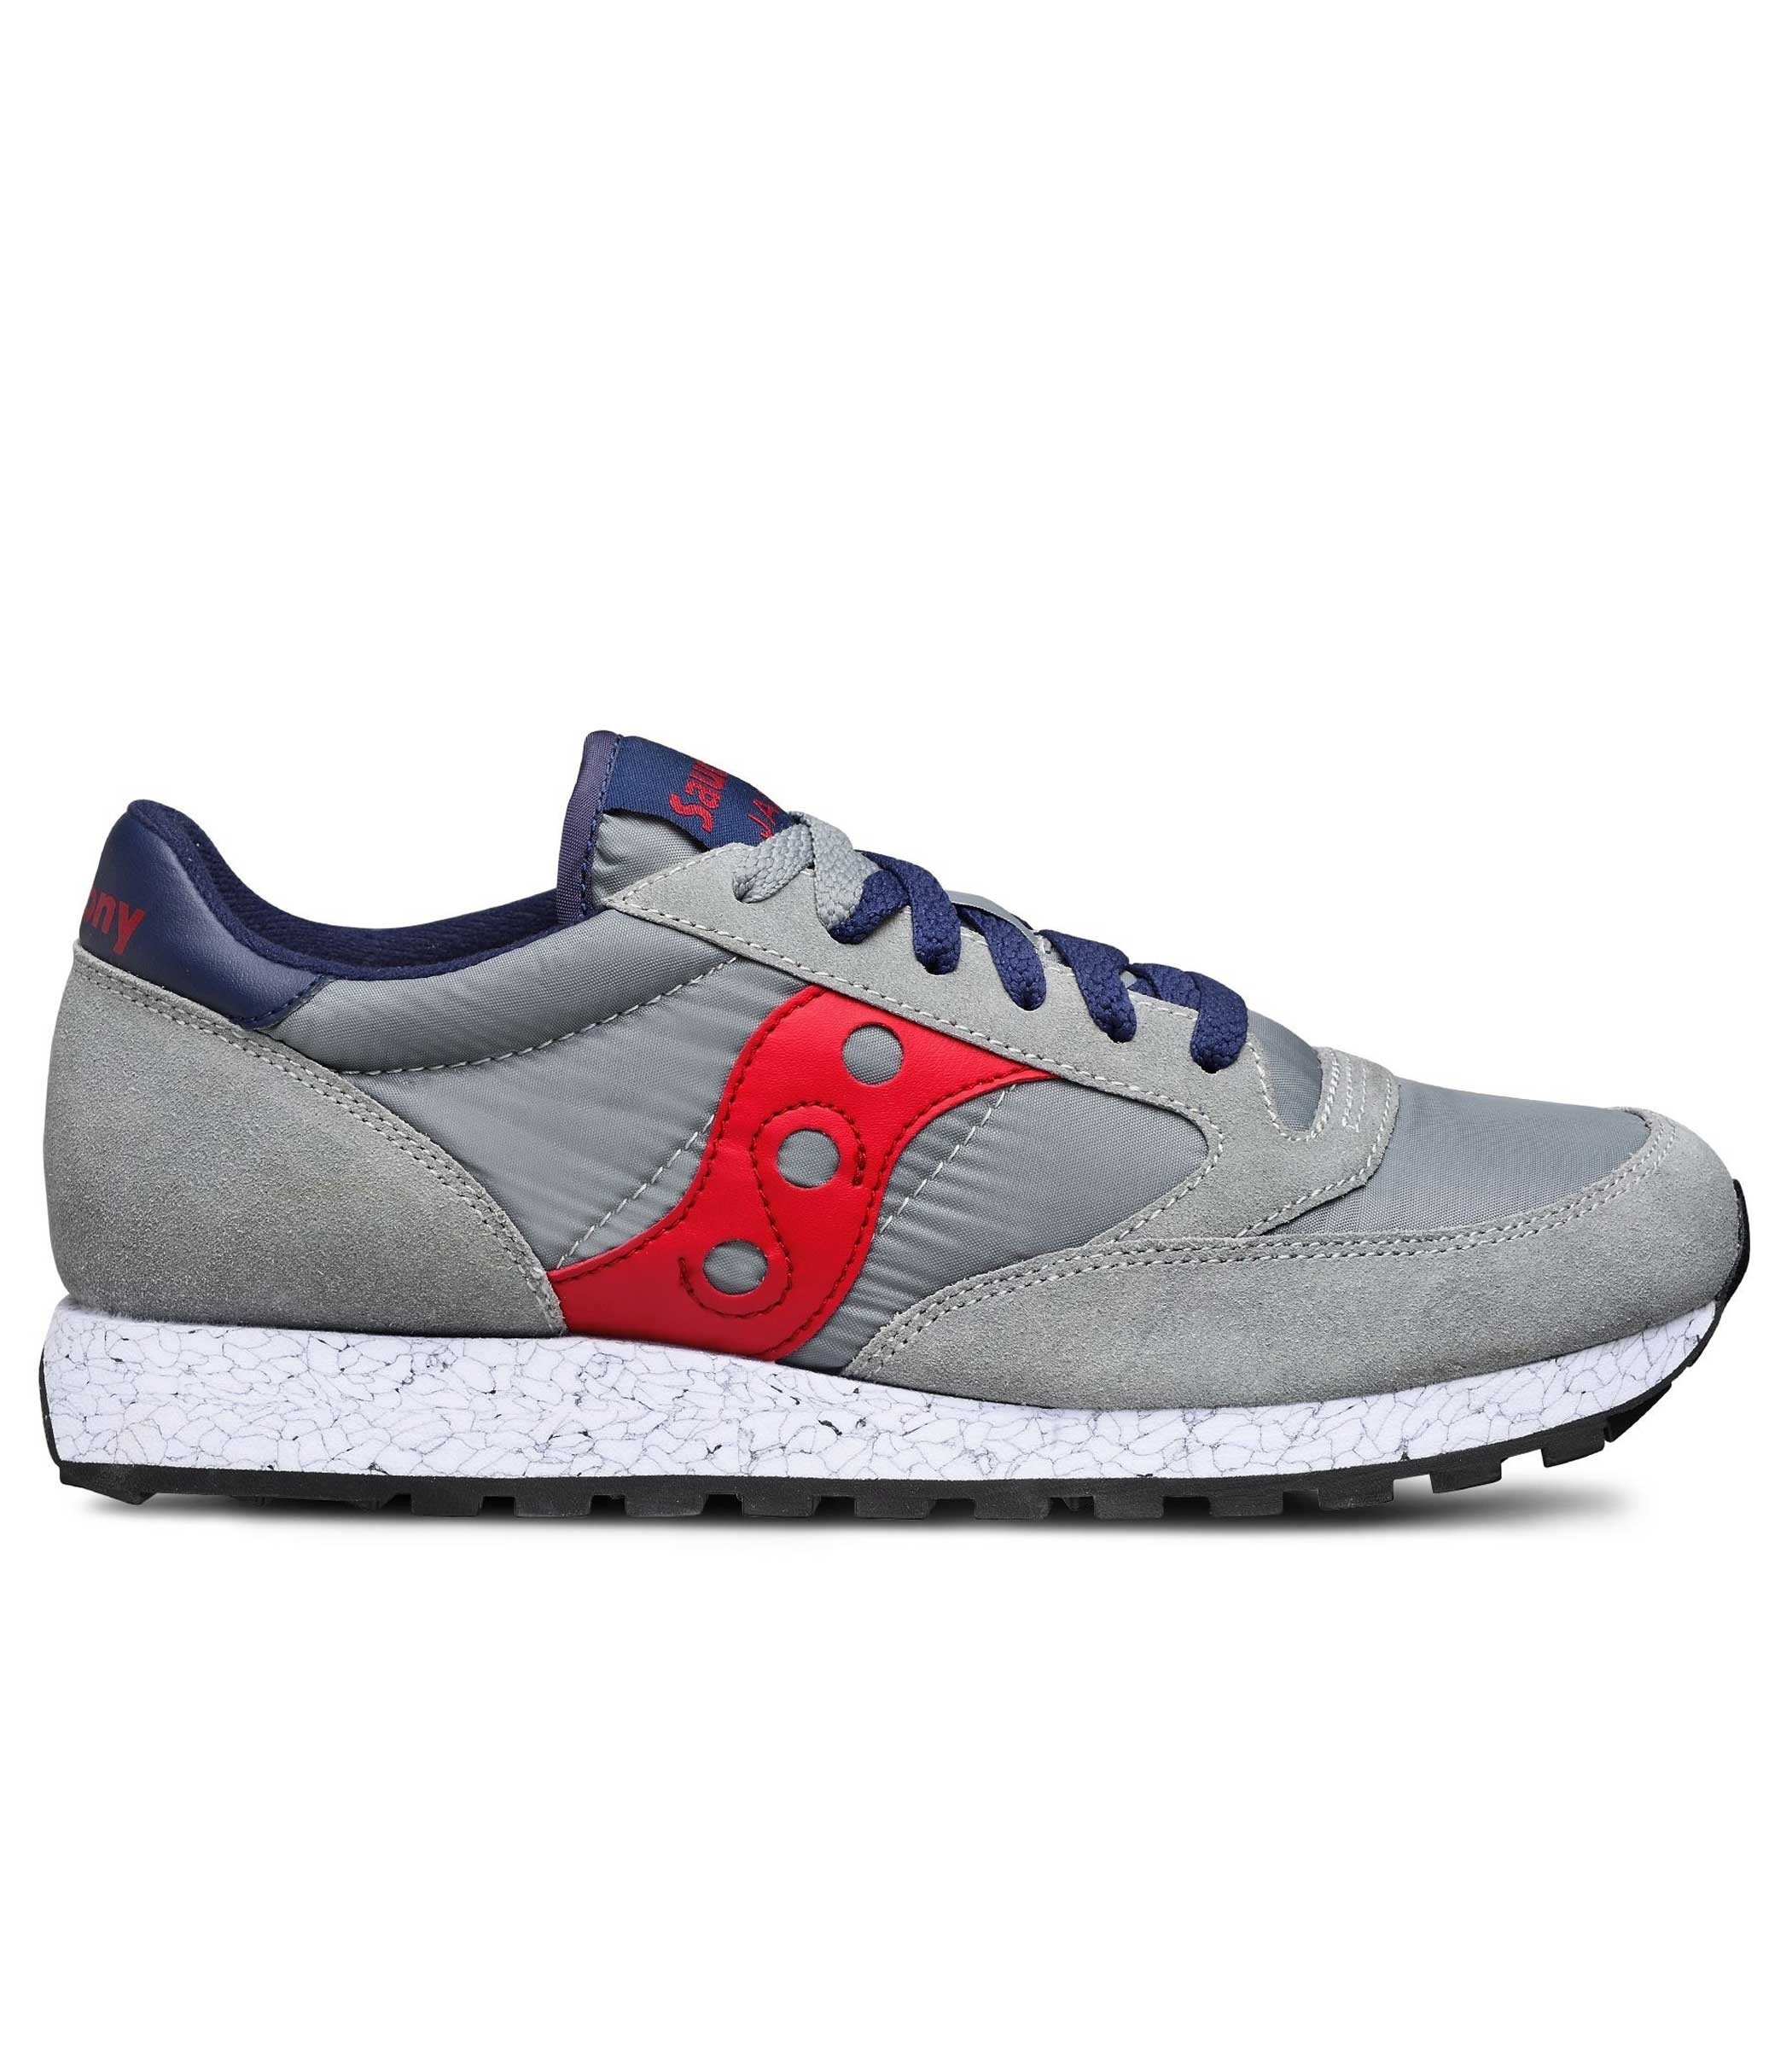 Scarpe Sneakers Saucony Jazz Original da uomo rif. S2044-516 8099eb65c6d